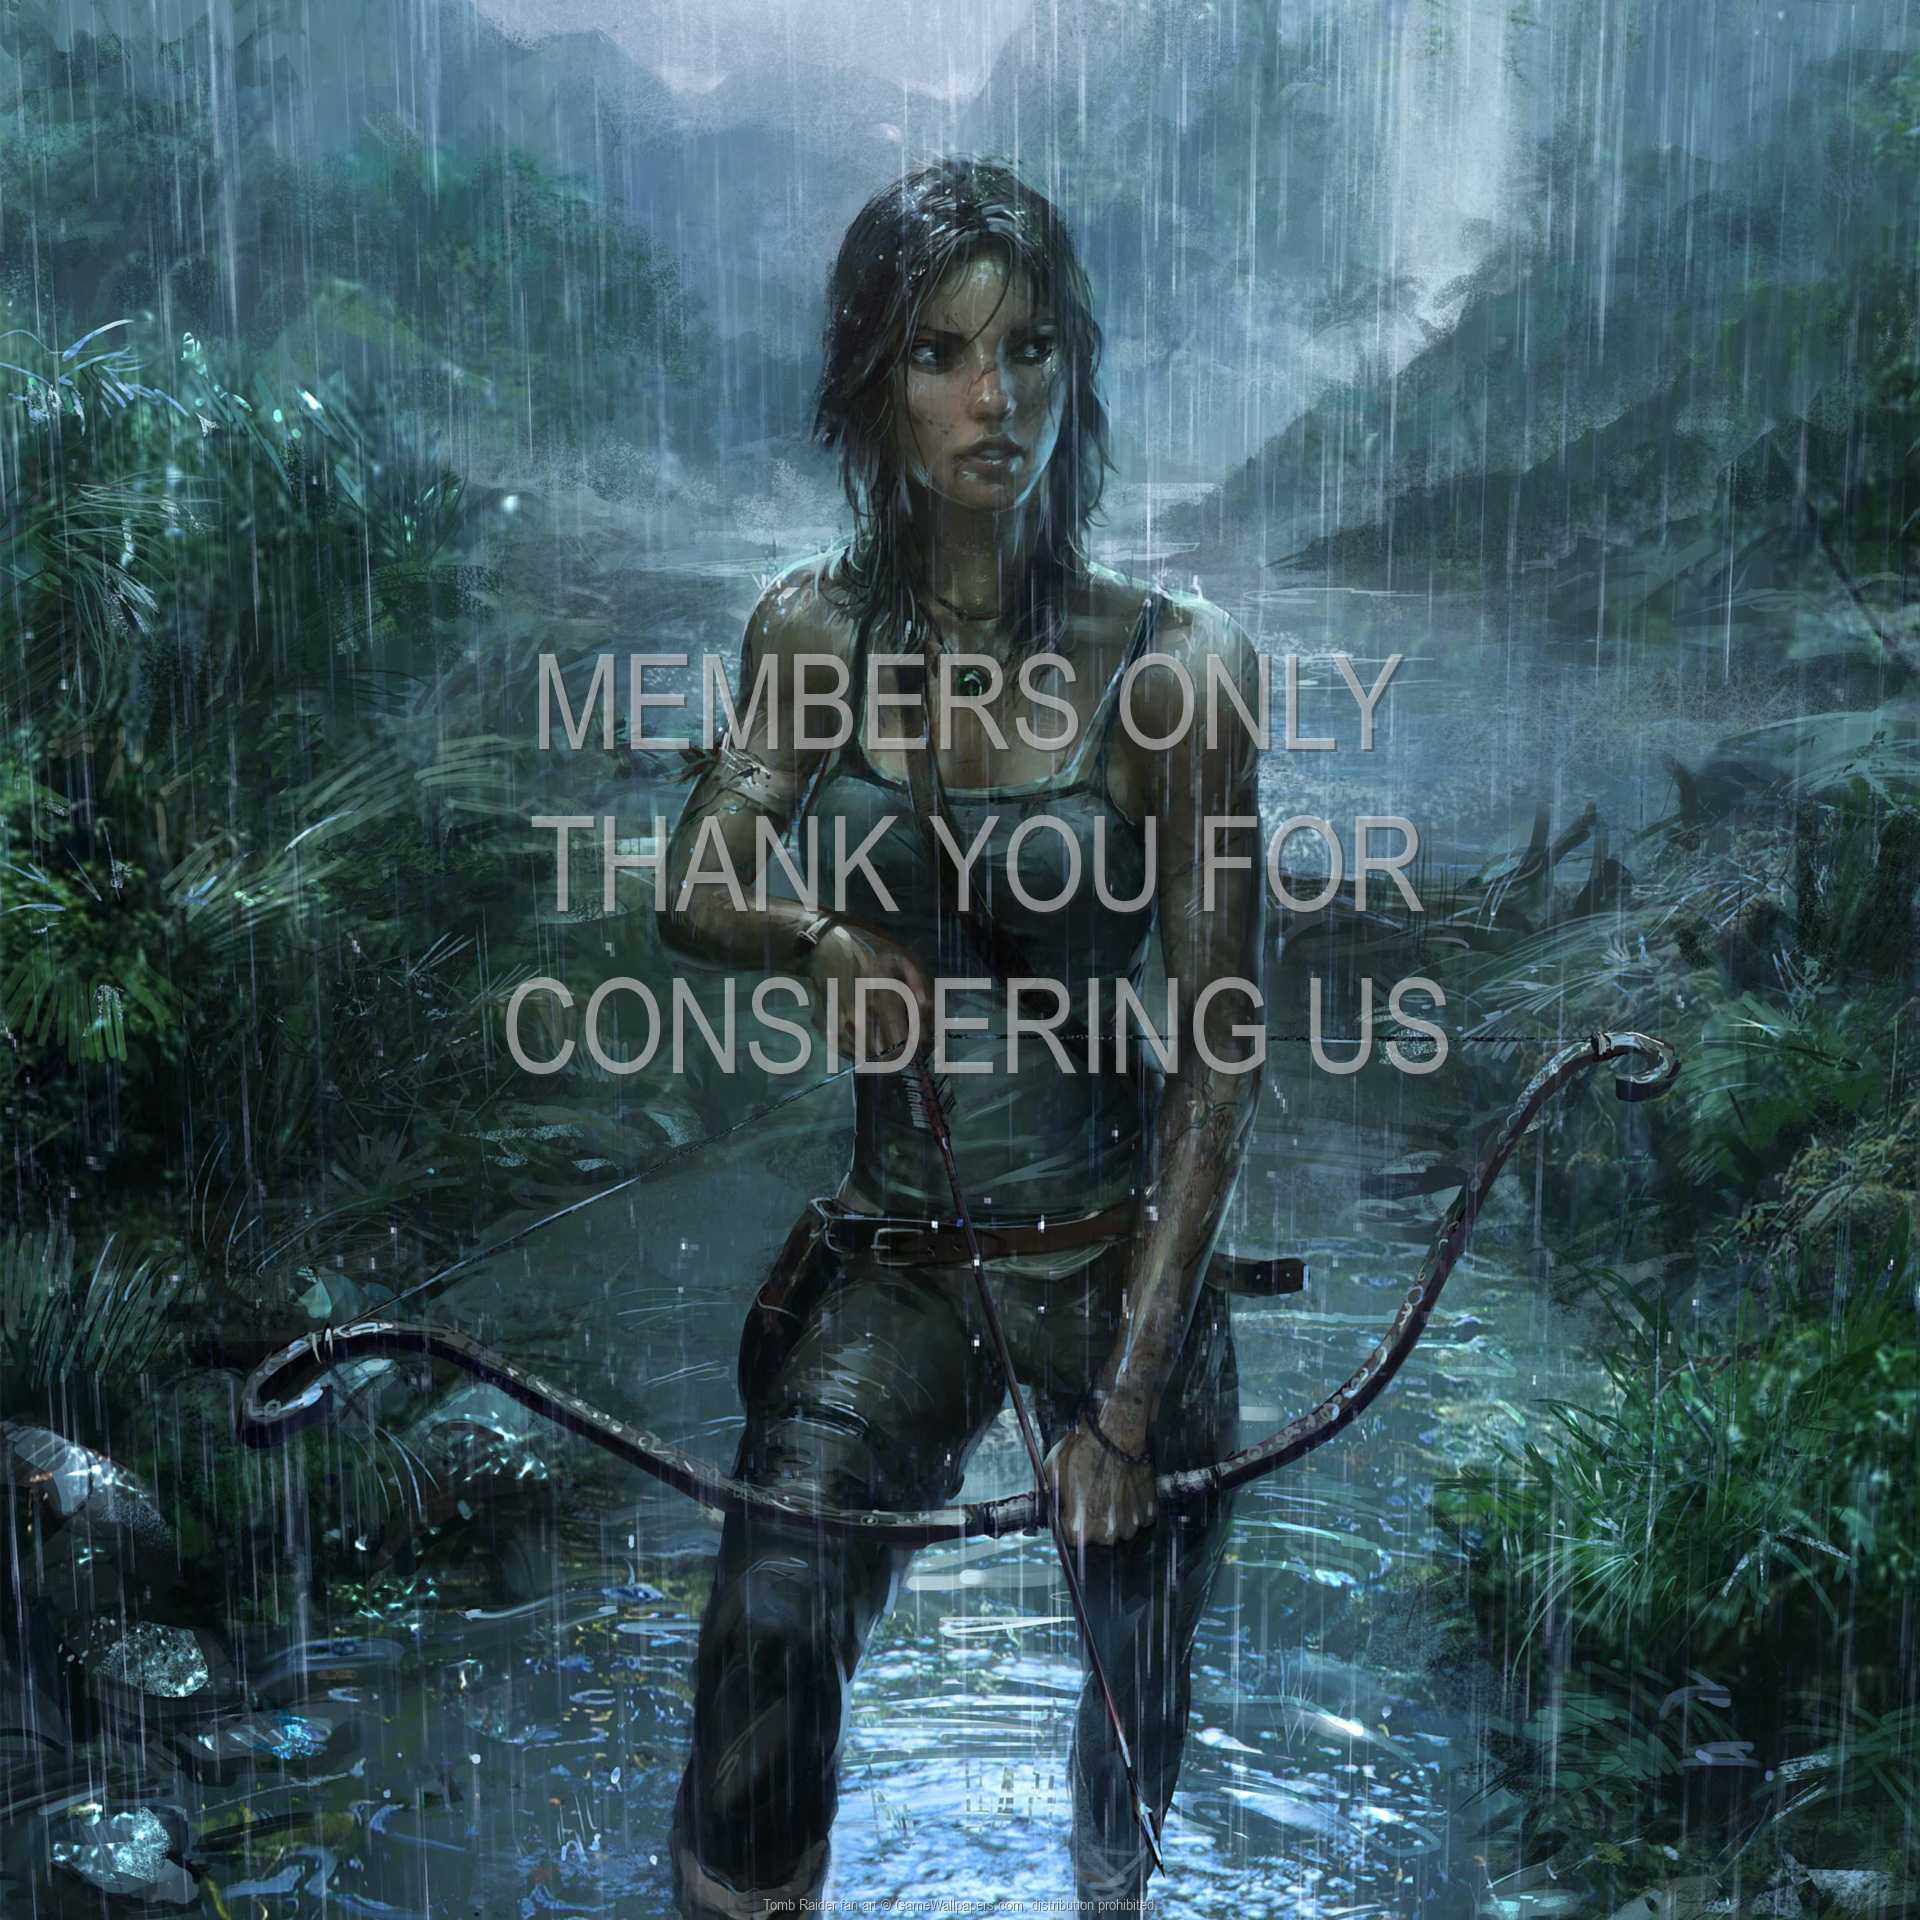 Tomb Raider fan art 1080p Horizontal Handy Hintergrundbild 01